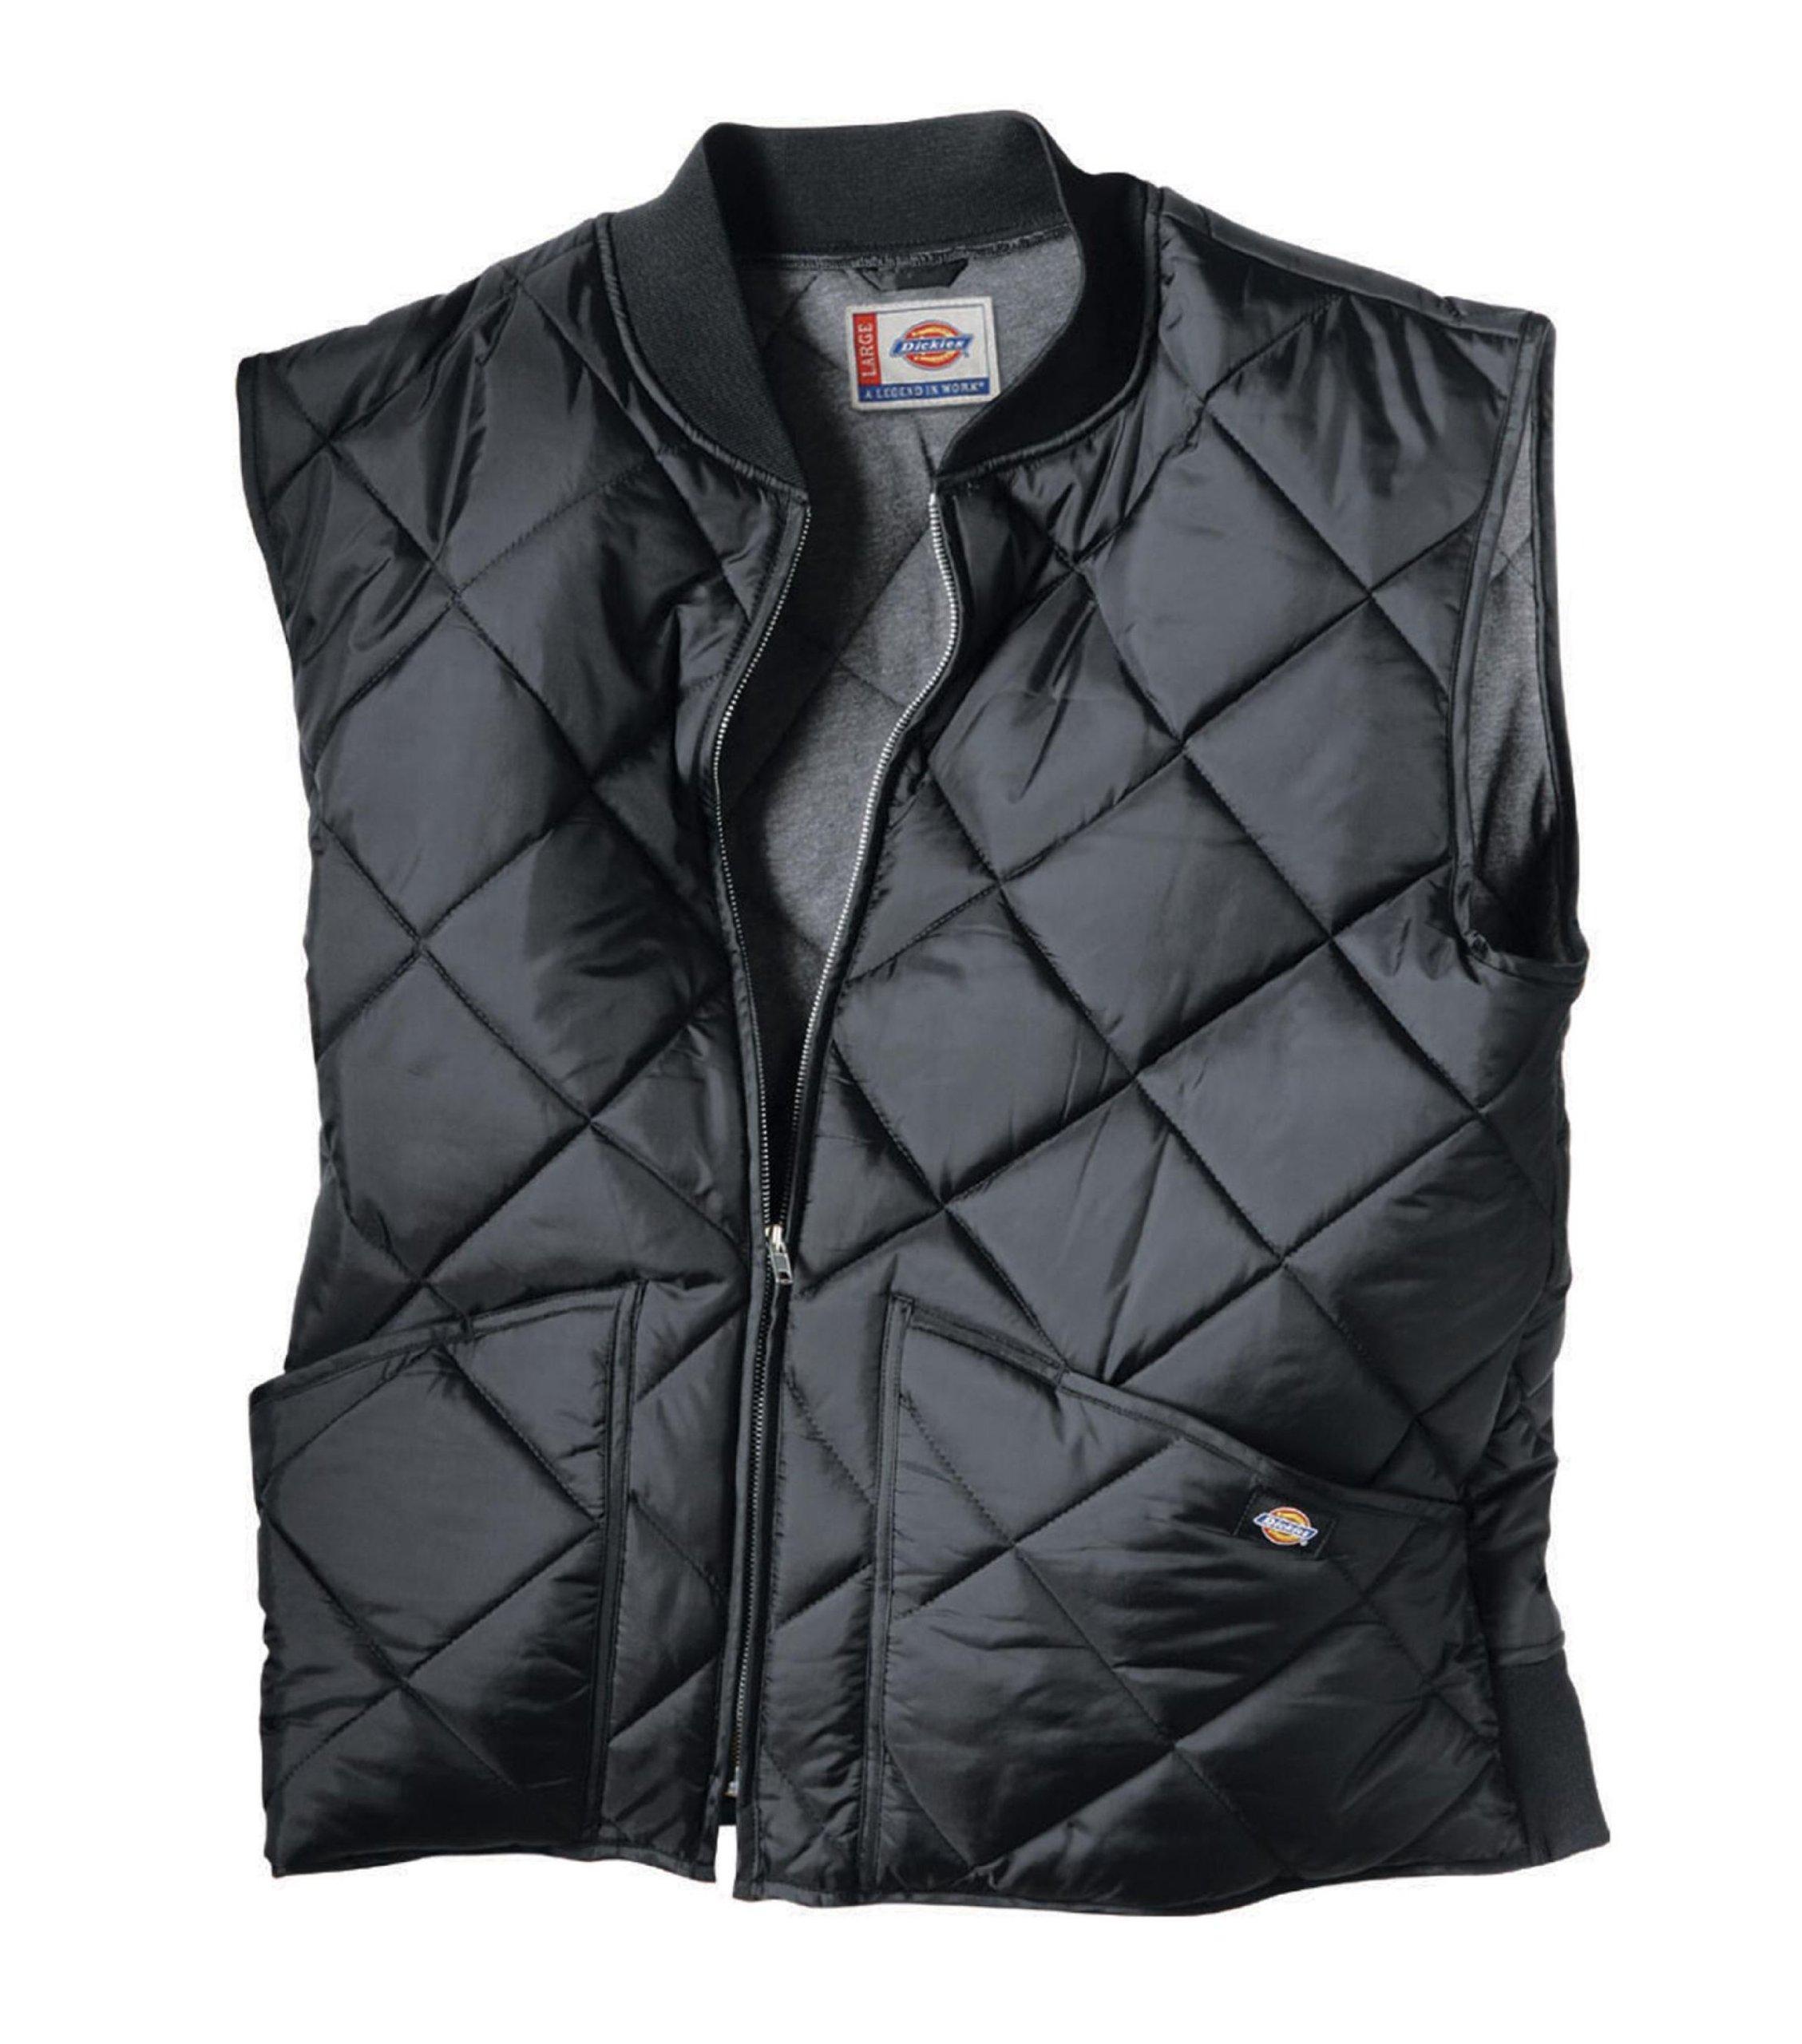 Dickies Men's Diamond Quilted Nylon Vest, Black, X-Large